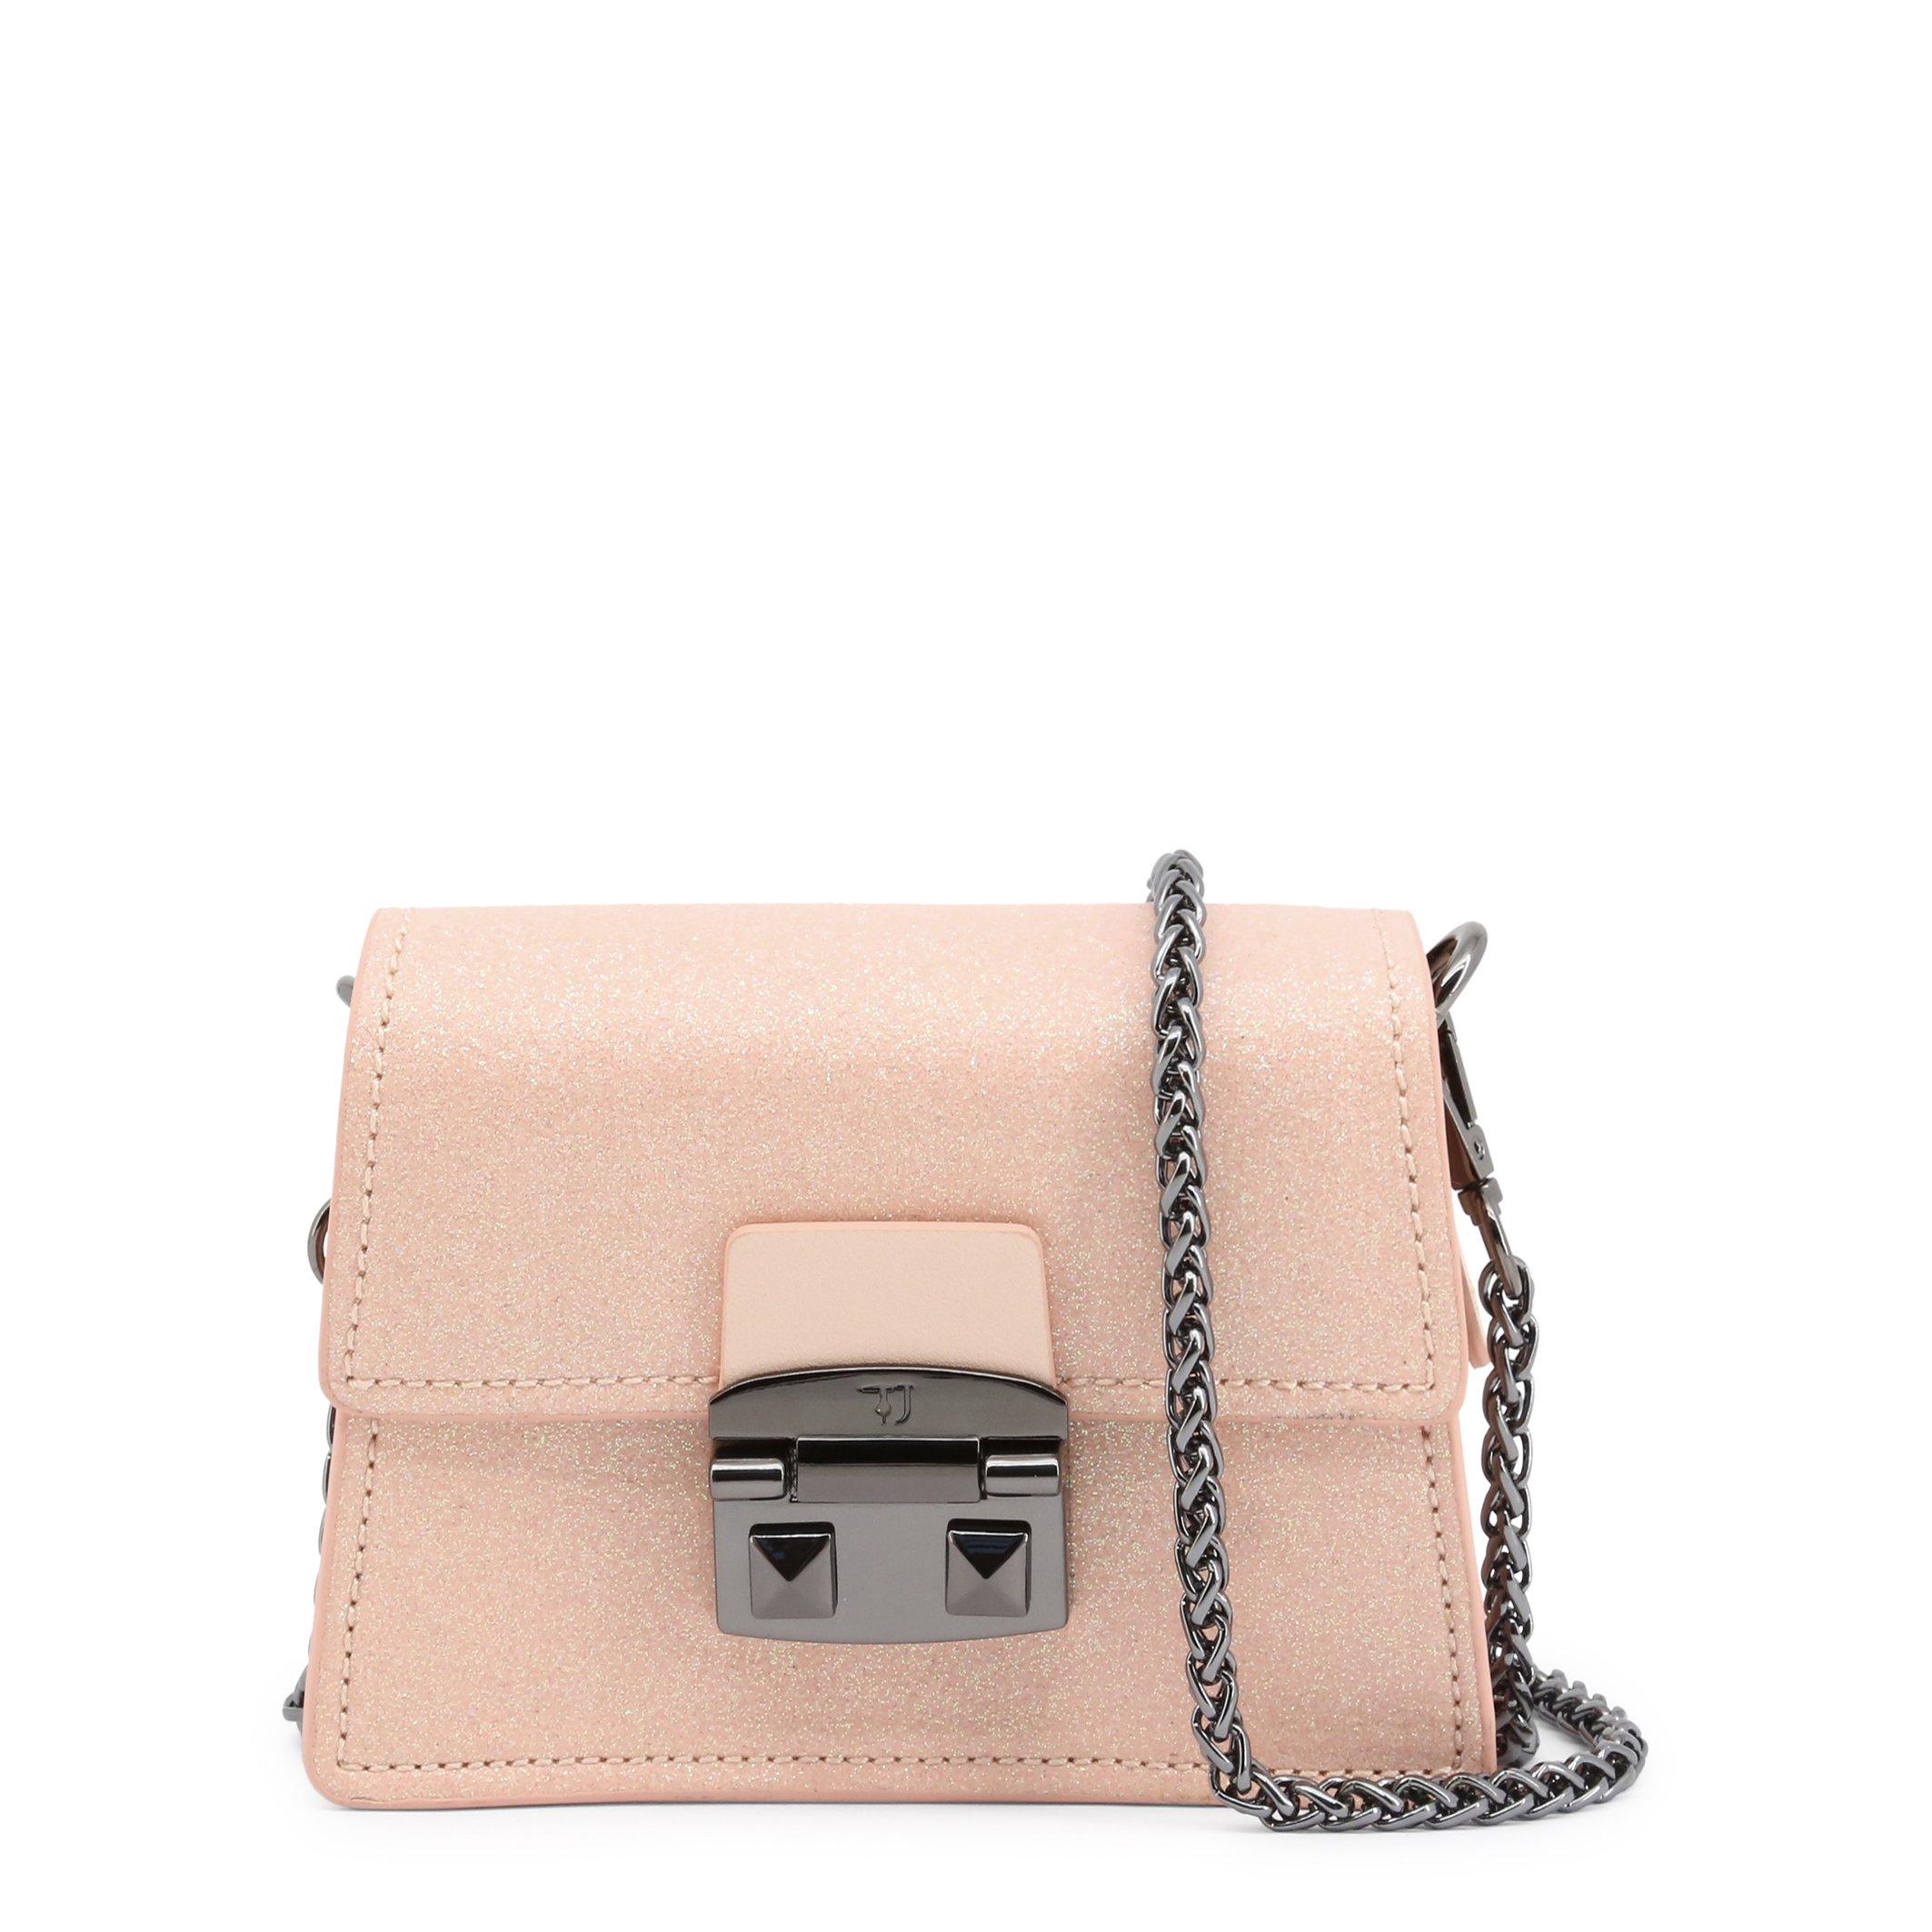 Trussardi Women's Clutch Bag Various Colours CORIANDOLO_75B00555 - pink NOSIZE